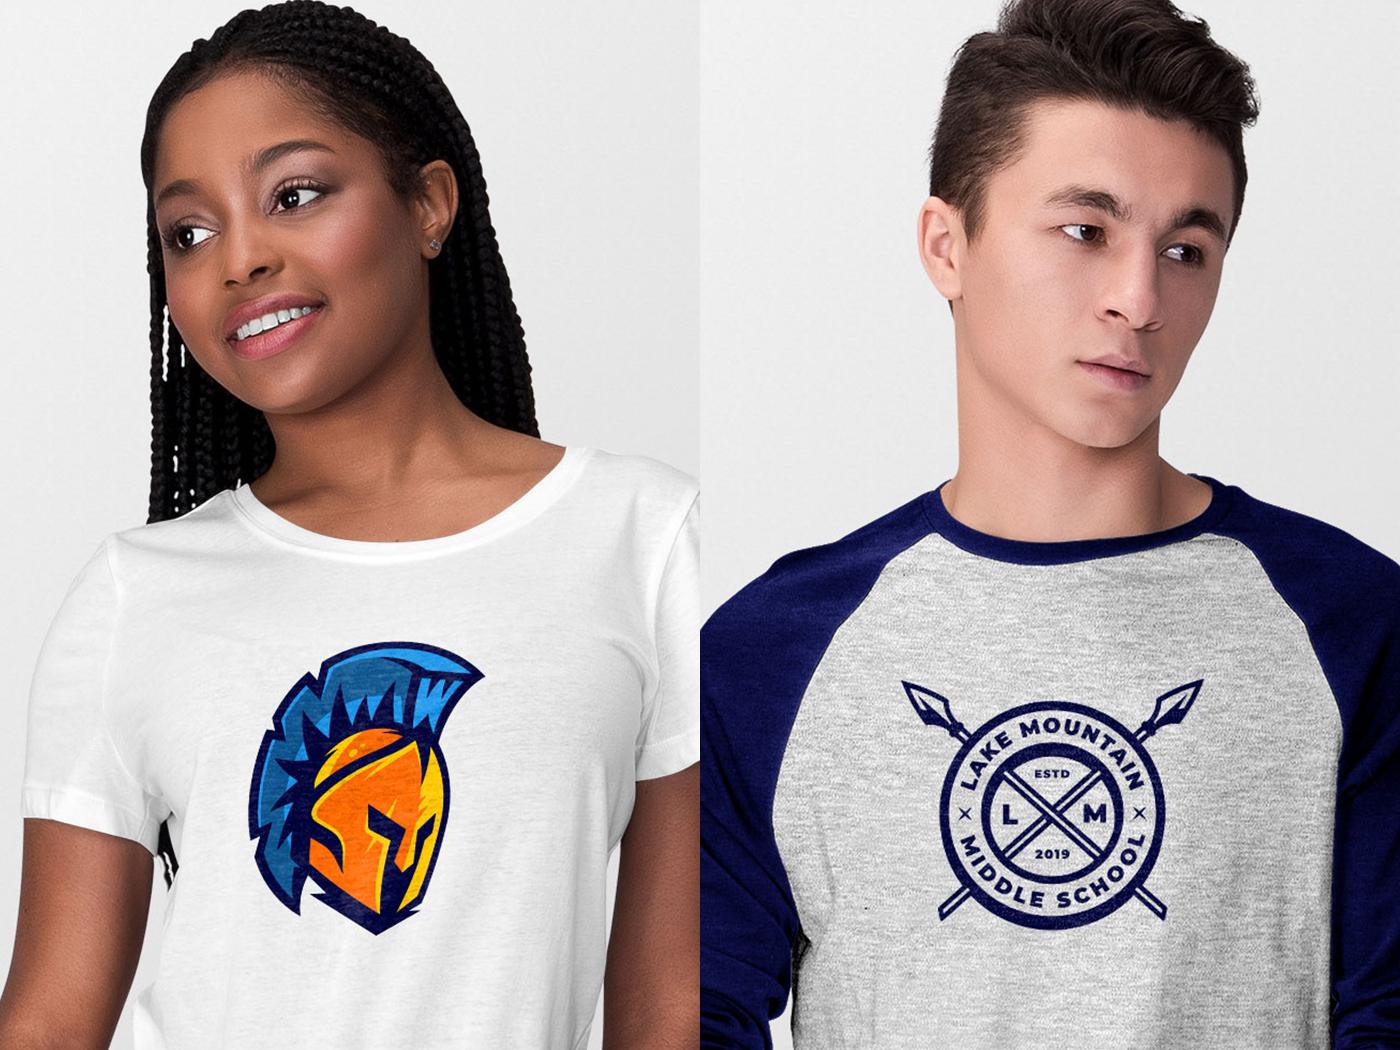 Warriors Shirt Designs high school rebrand shield armor greek espn sports football nfl spartan